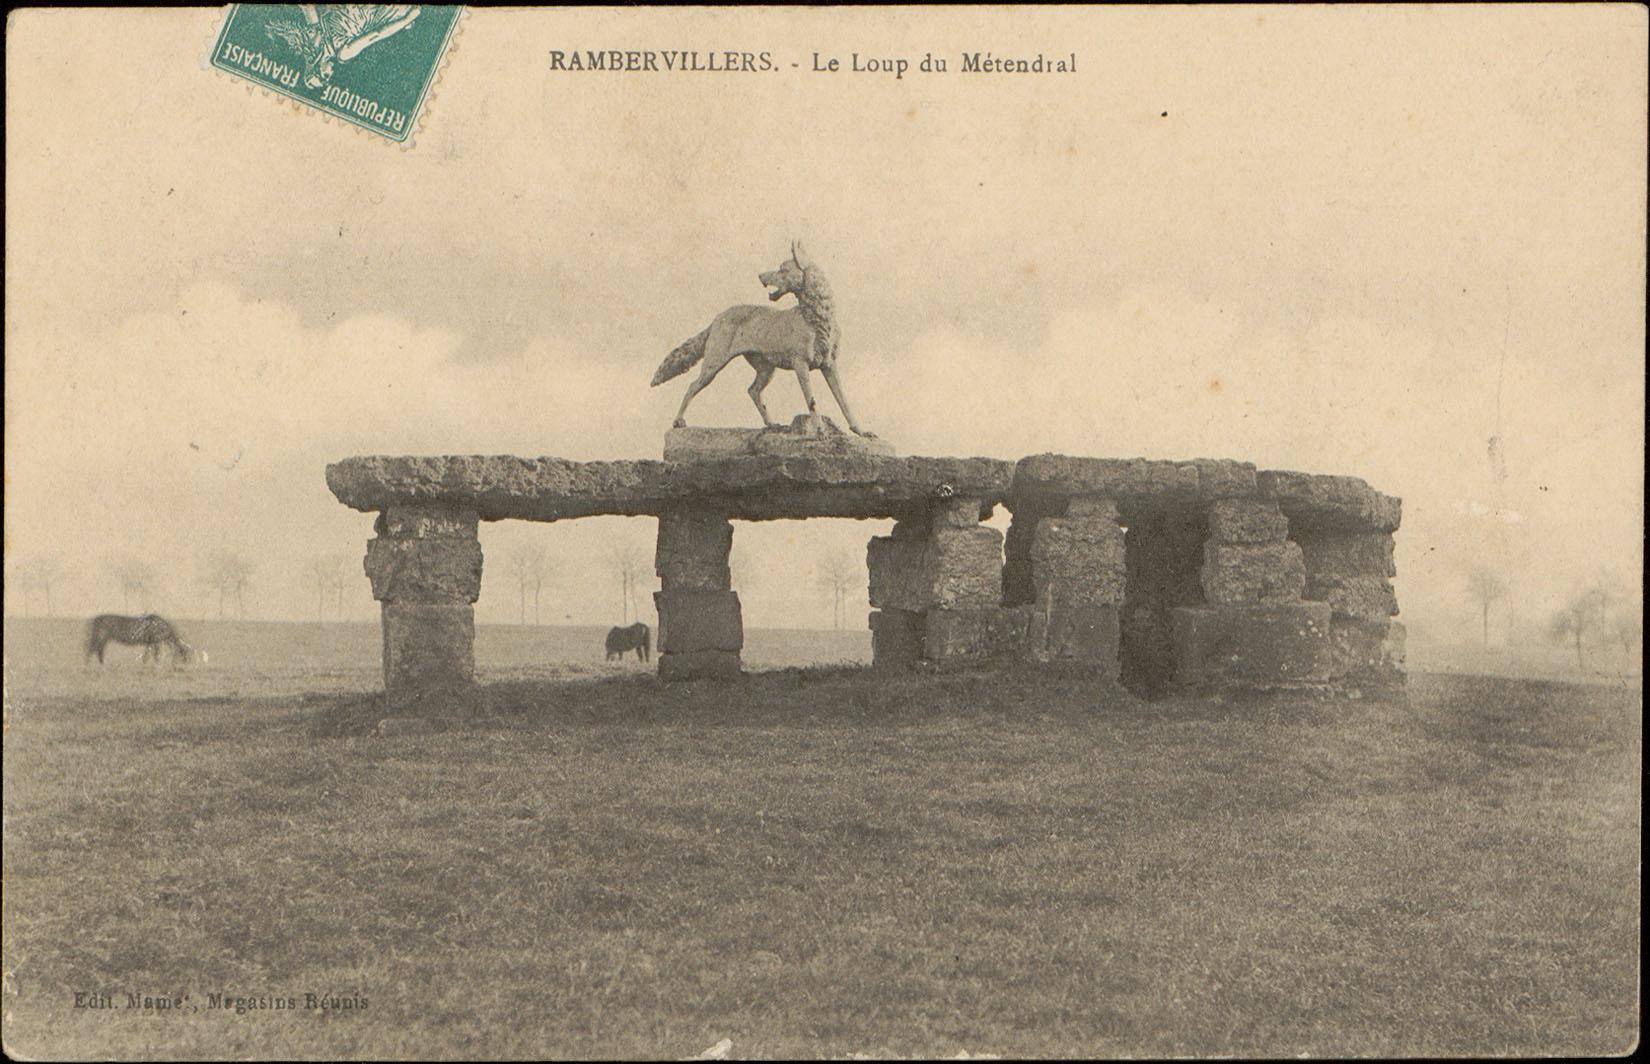 Contenu du Rambervillers, Le Loup de Métendral